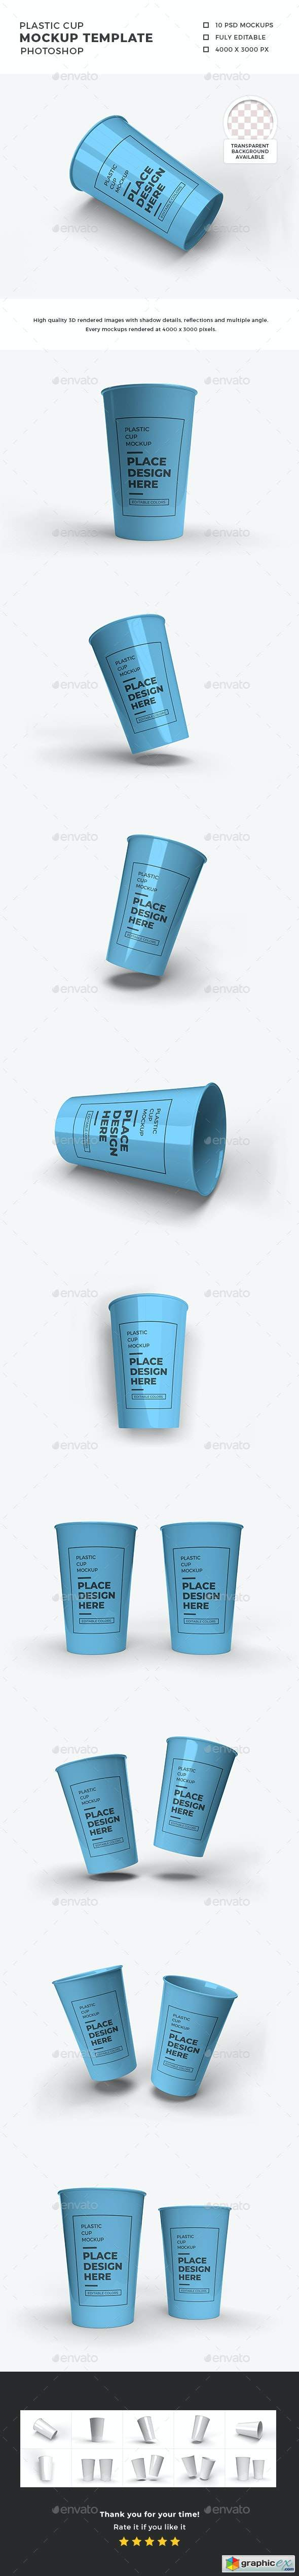 Plastic Cup Mockup Template Set